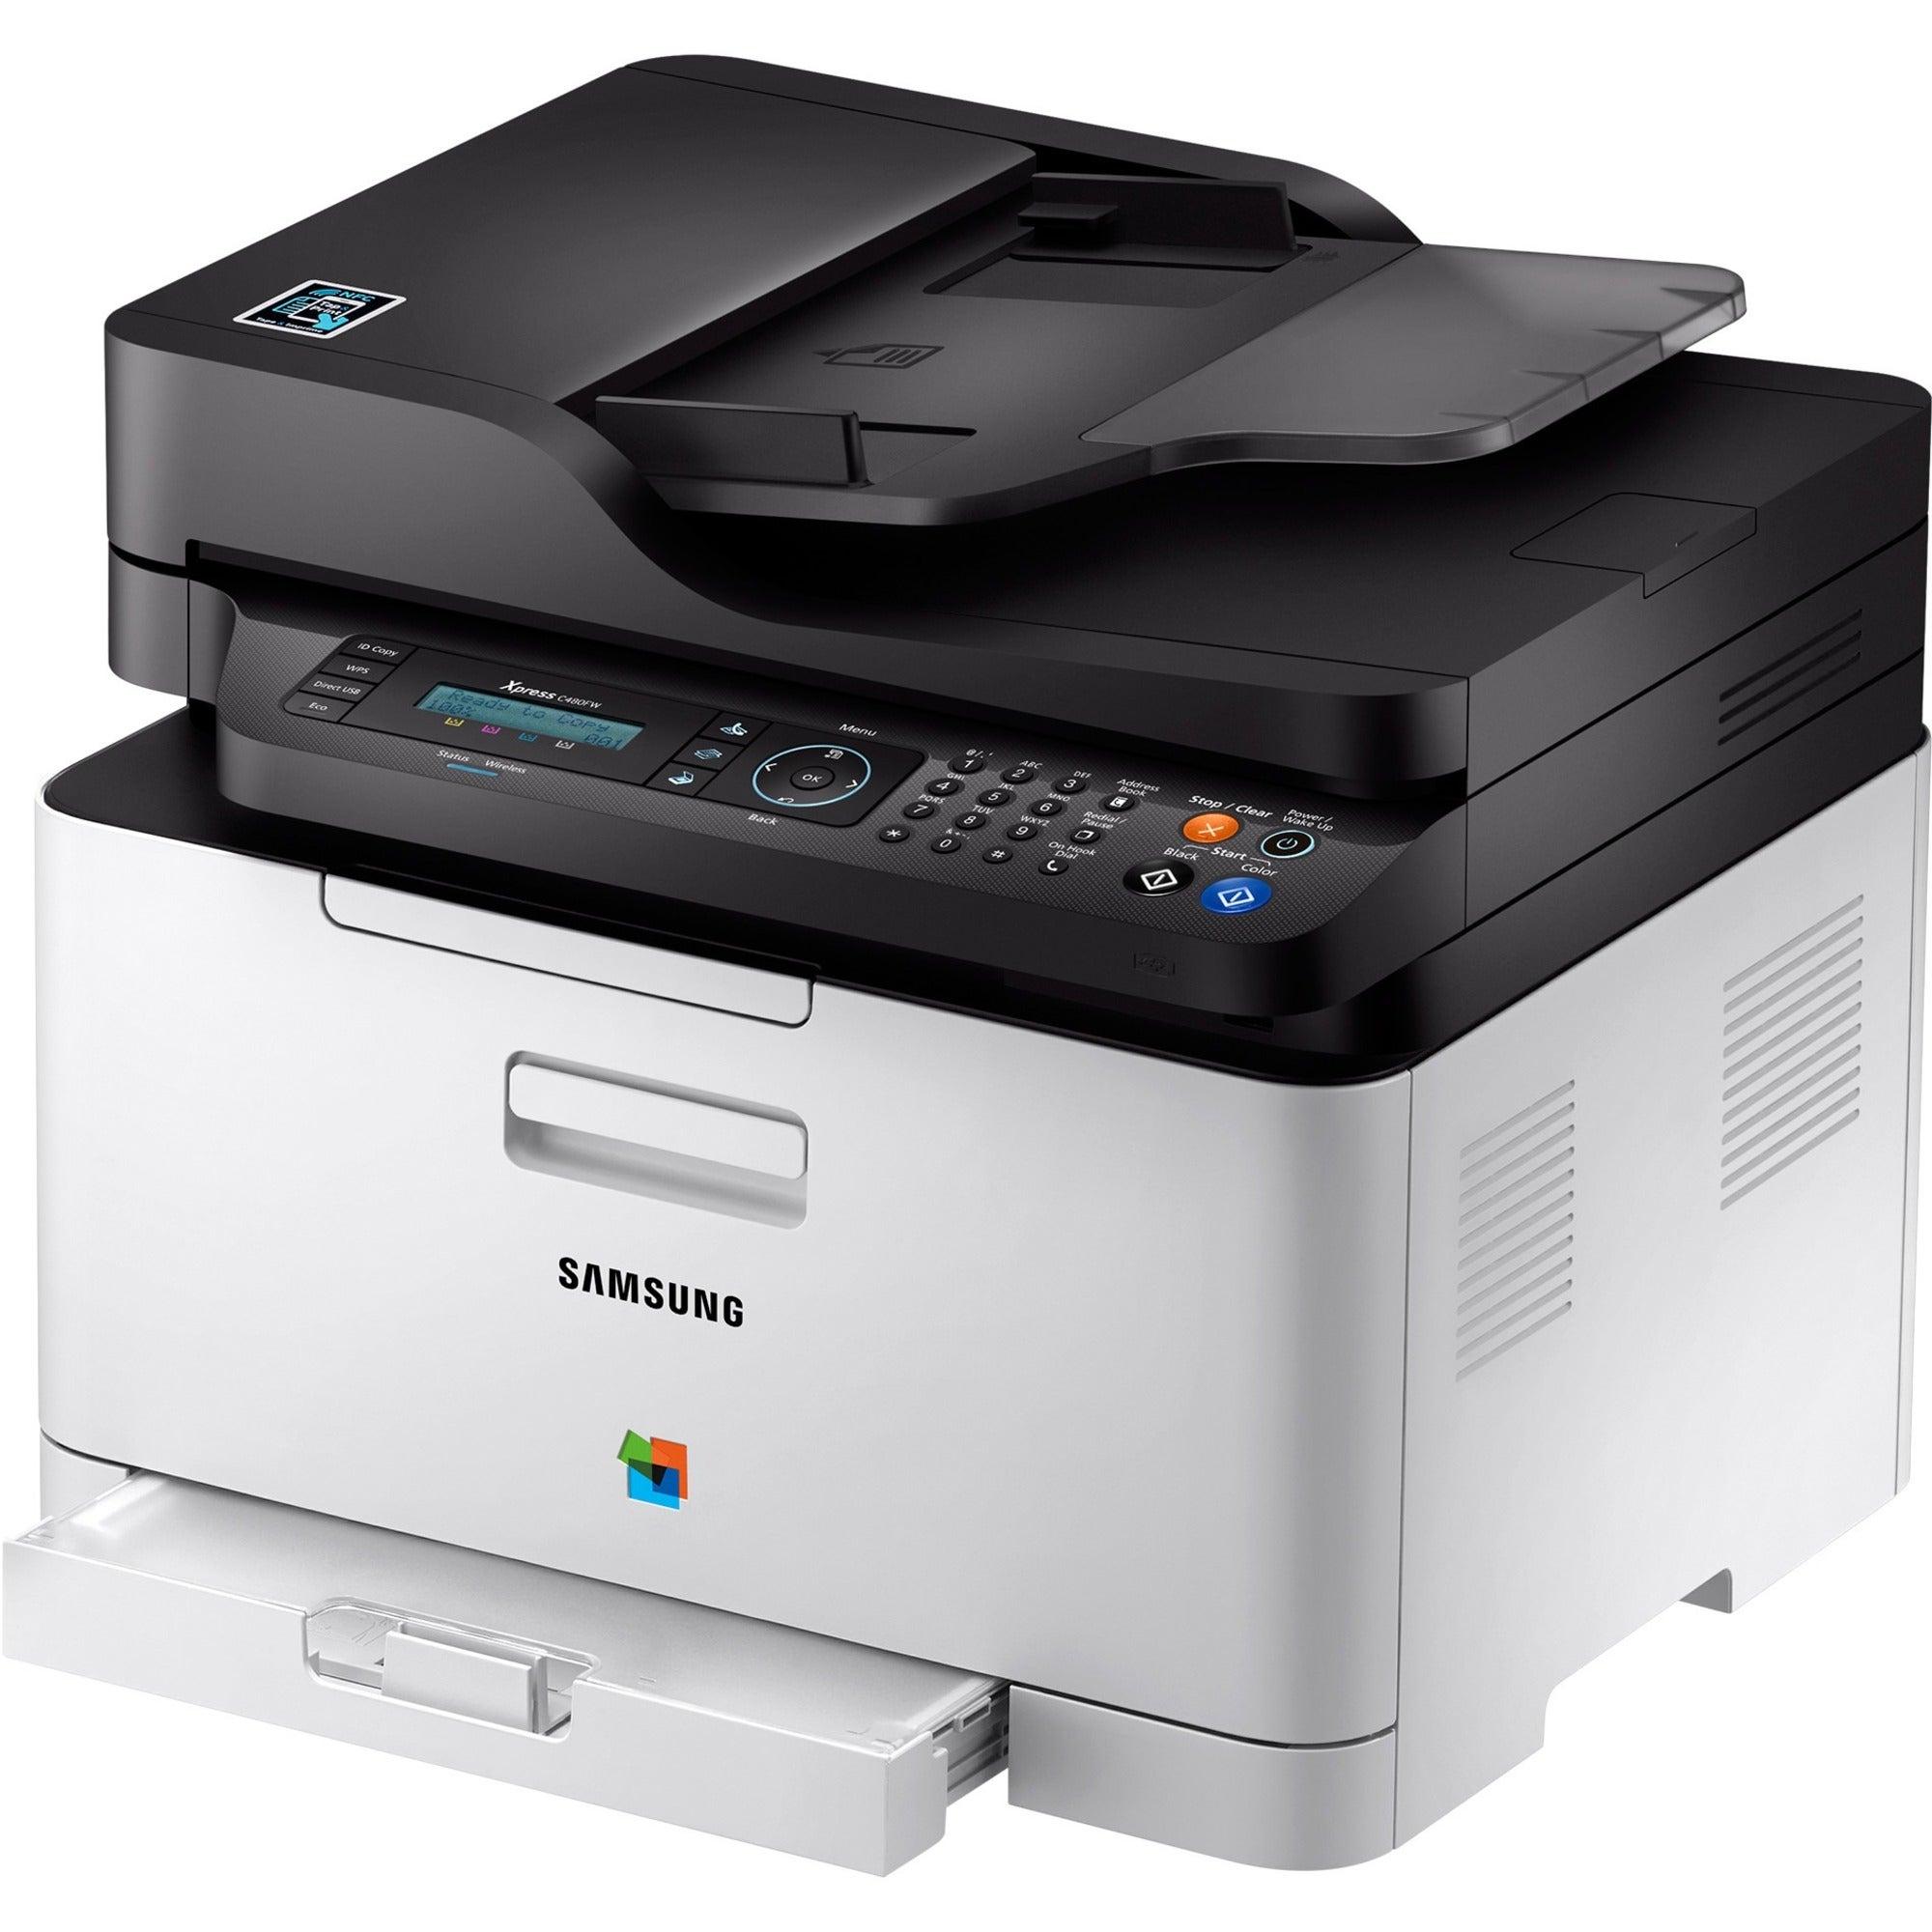 Samsung Xpress SL-C480FW Laser Multifunction Printer - Color - Plain